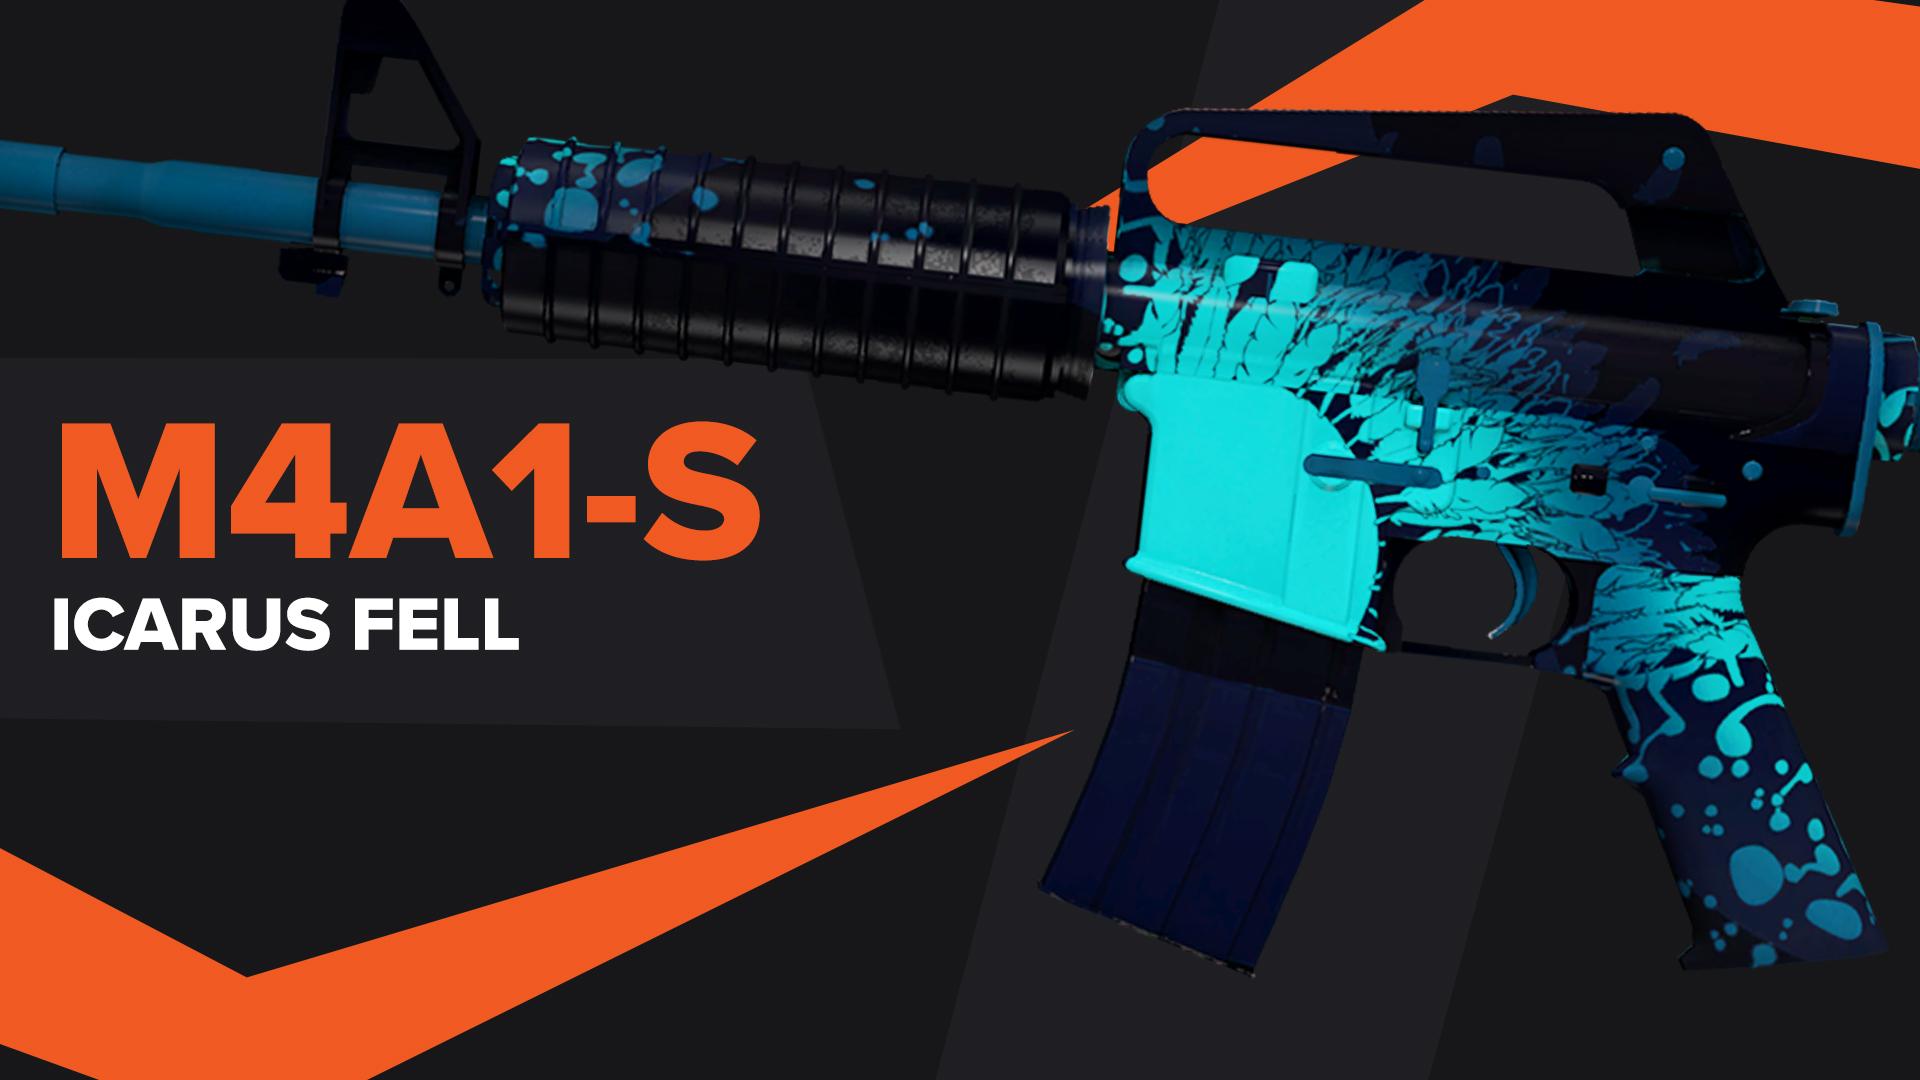 Icarus Fell CSGO Skin M4A1S